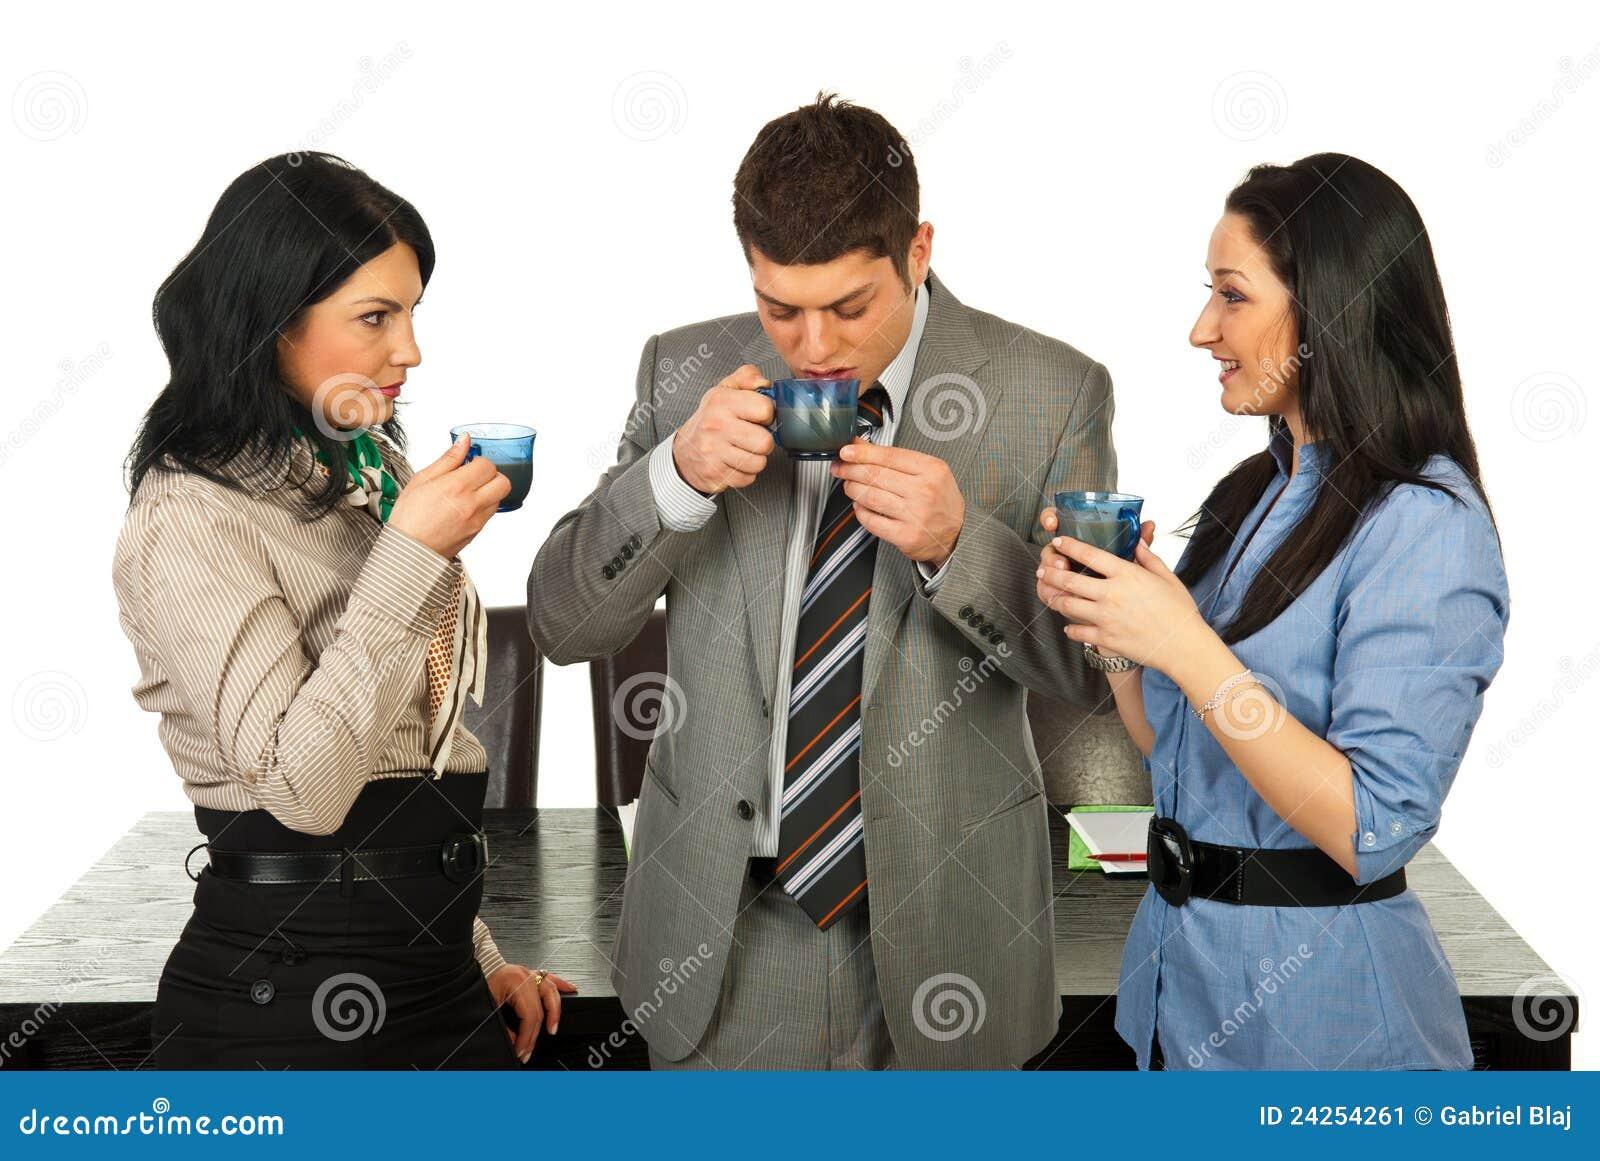 Business People Having Coffee Break Stock Image - Image ...